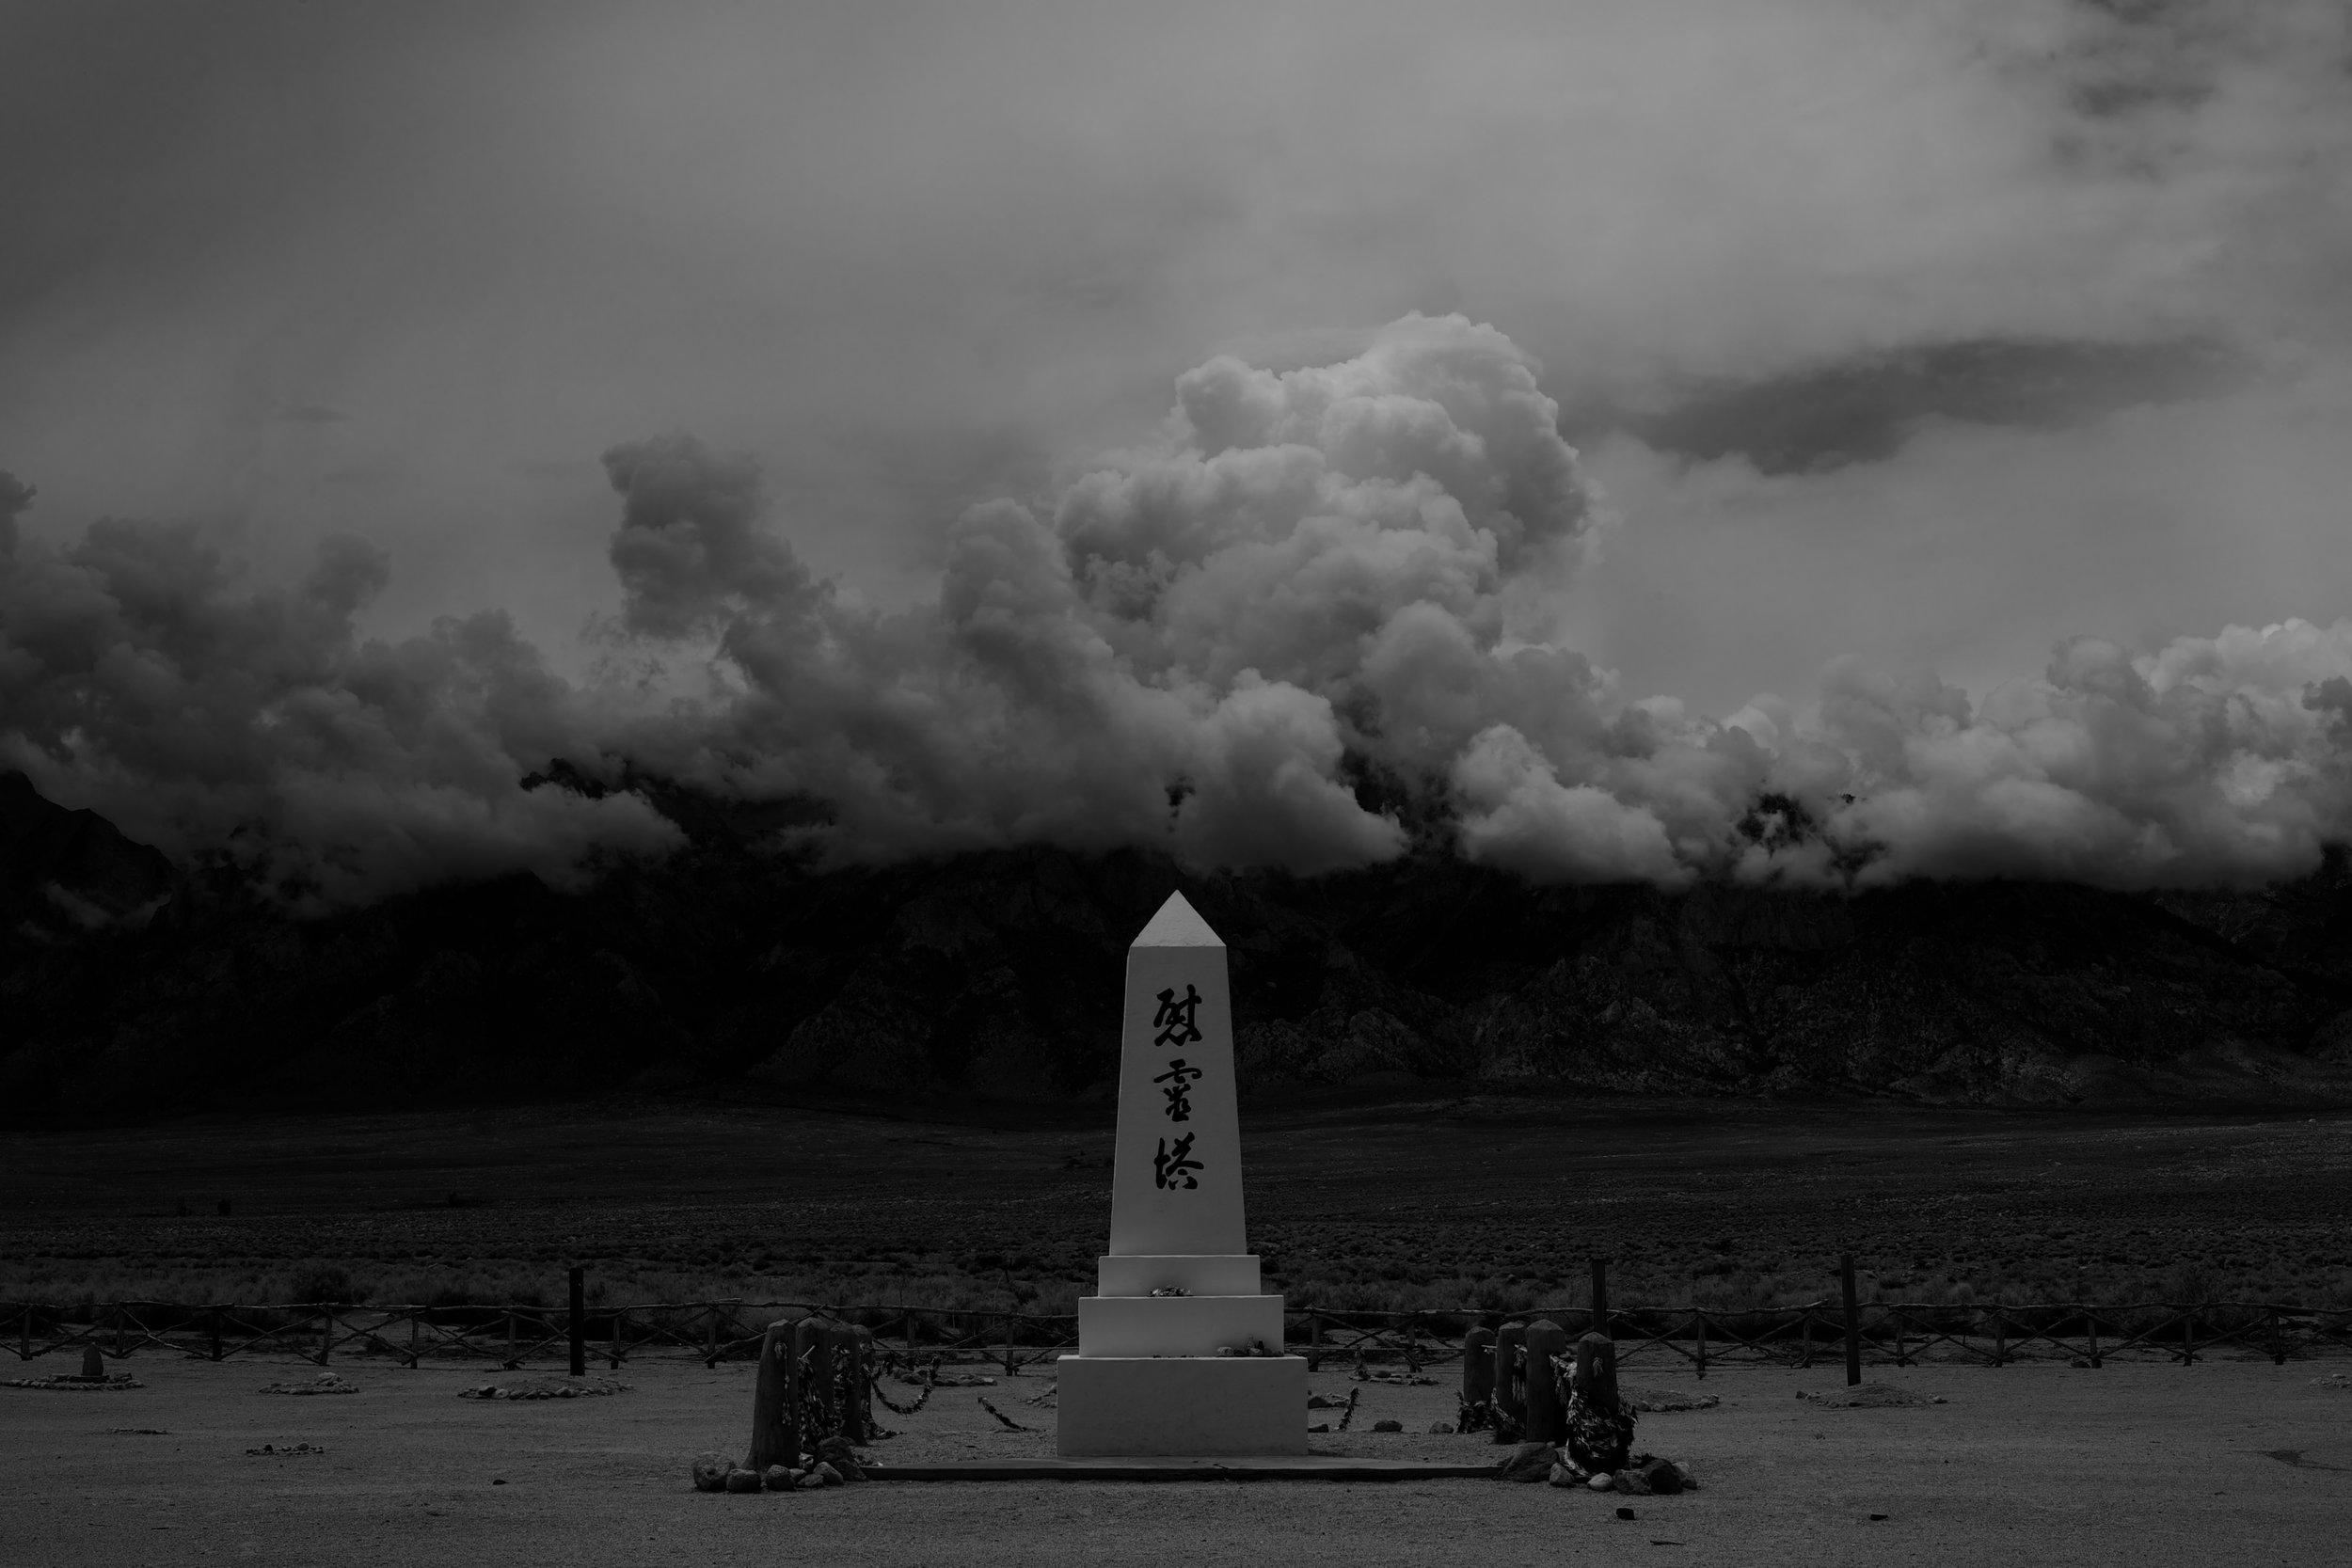 Manzanar War Relocation Center/Monument, Independence, CA